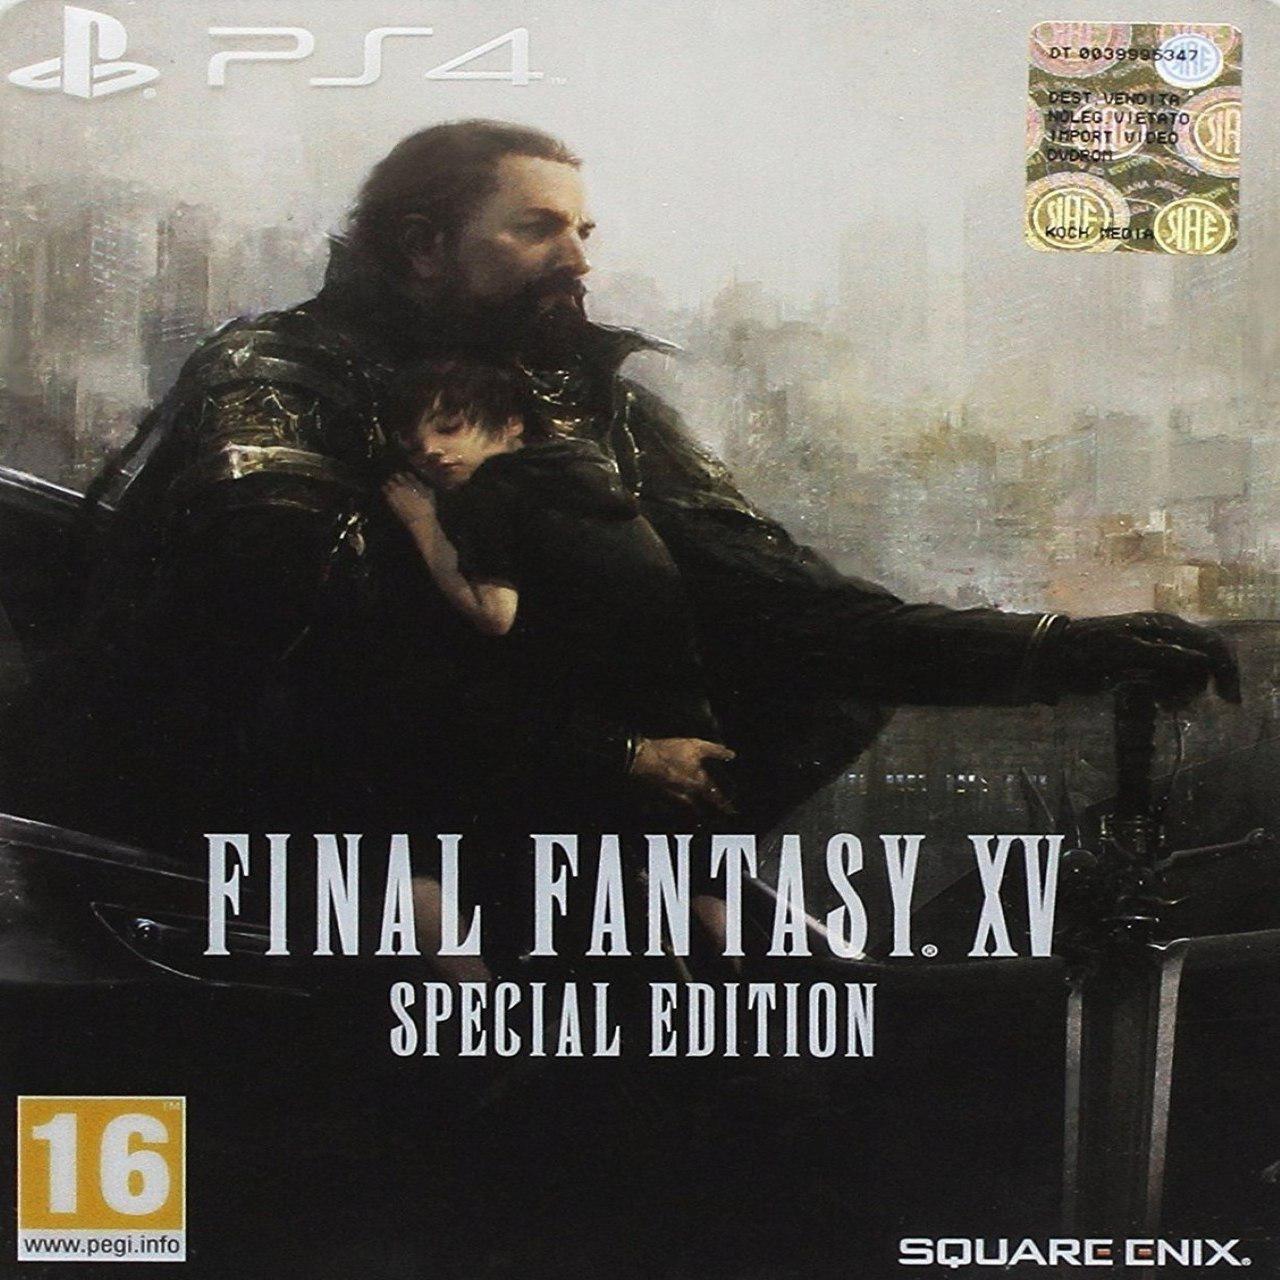 Final Fantasy XV Special Edition Steelbook (російська версія) Xbox One